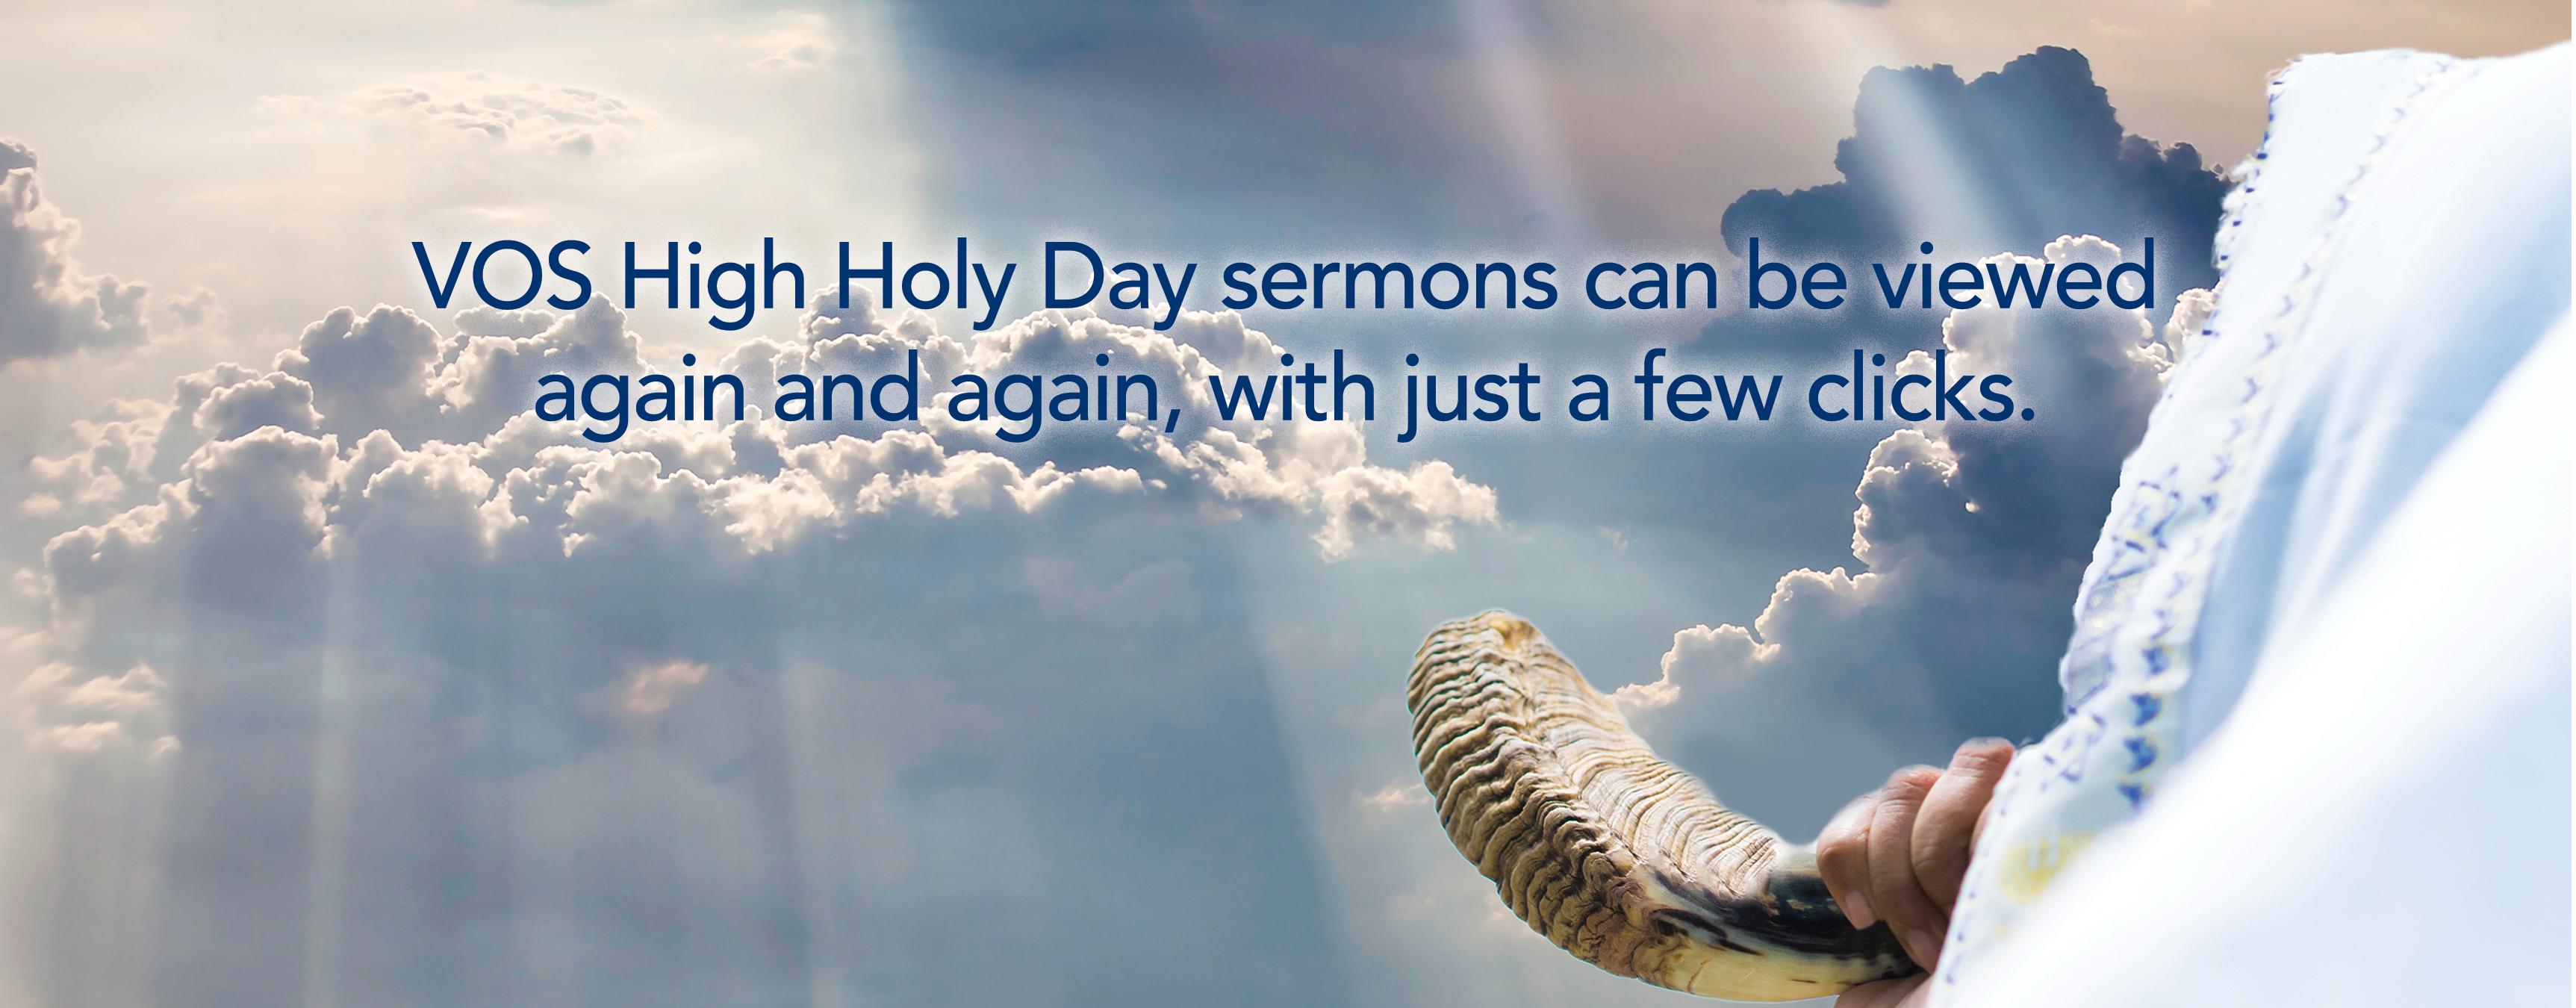 "<a href=""https://www.vosla.org/high-holy-day-sermons.html""                                     target=""_blank"">                                                                 <span class=""slider_title"">                                     Click Here to Listen to the High Holy Day Sermons                                </span>                                                                 </a>"